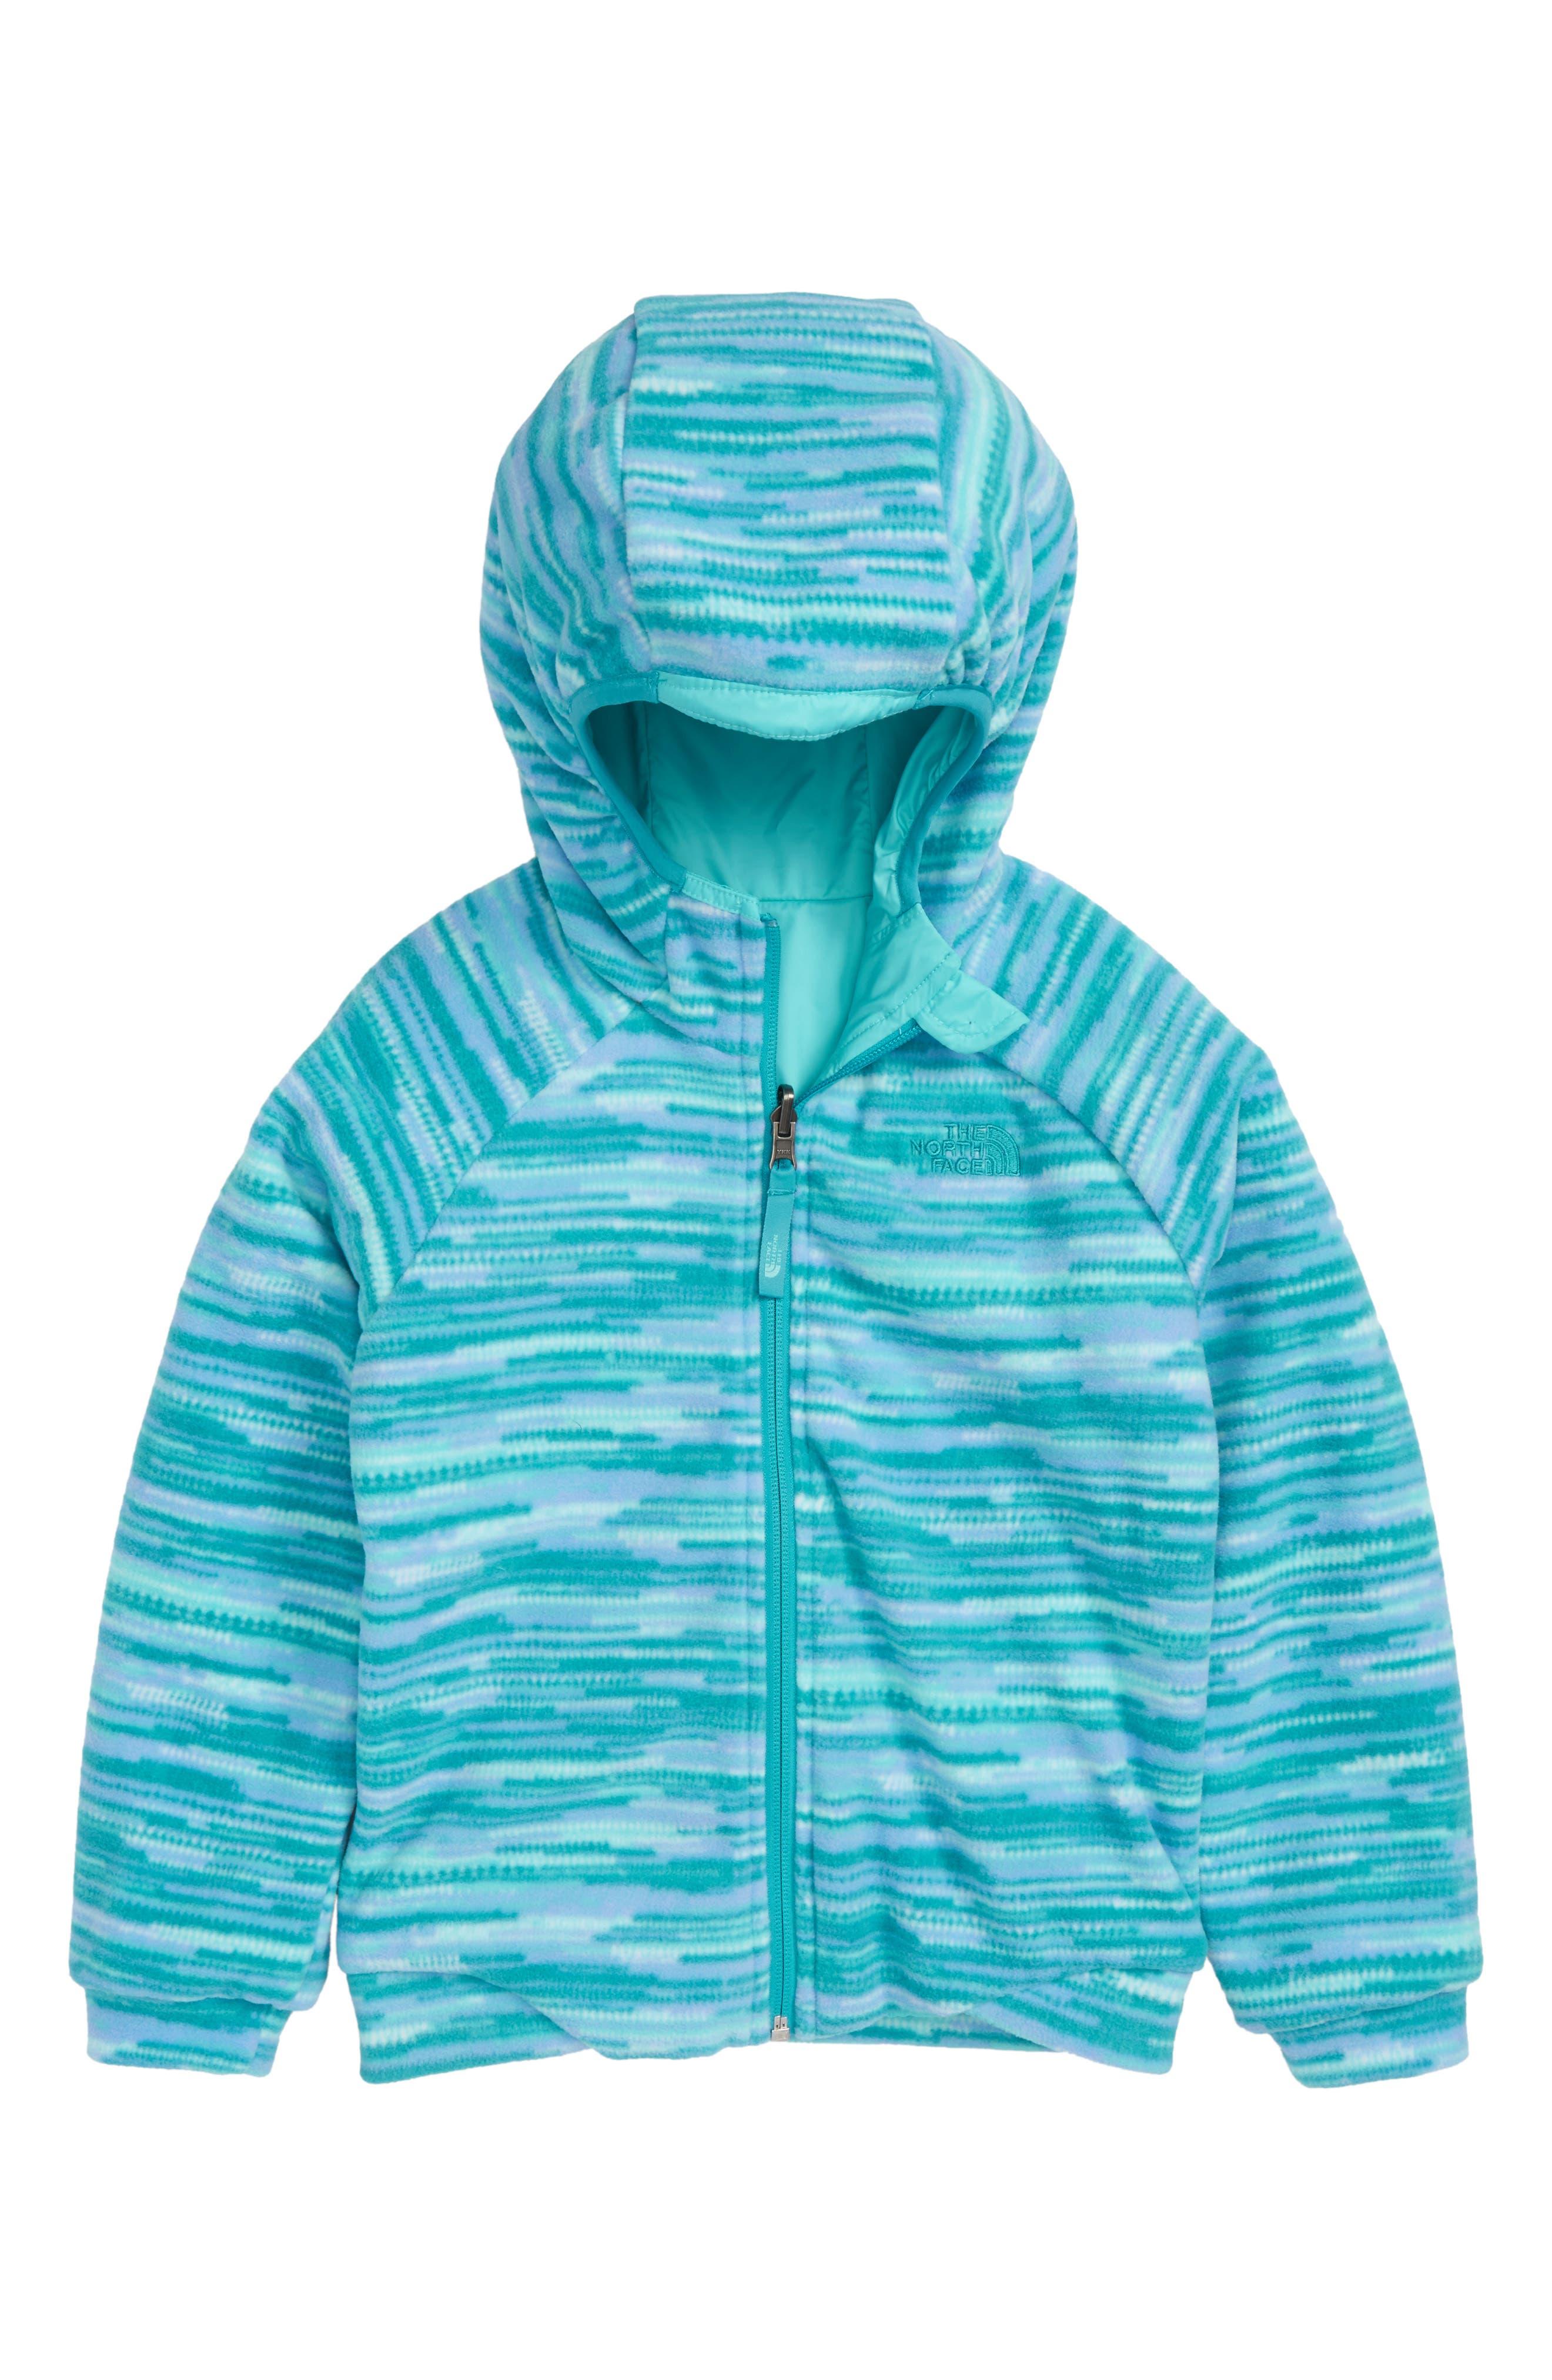 Breezeway Reversible Wind Jacket,                             Alternate thumbnail 2, color,                             Blue Curacao